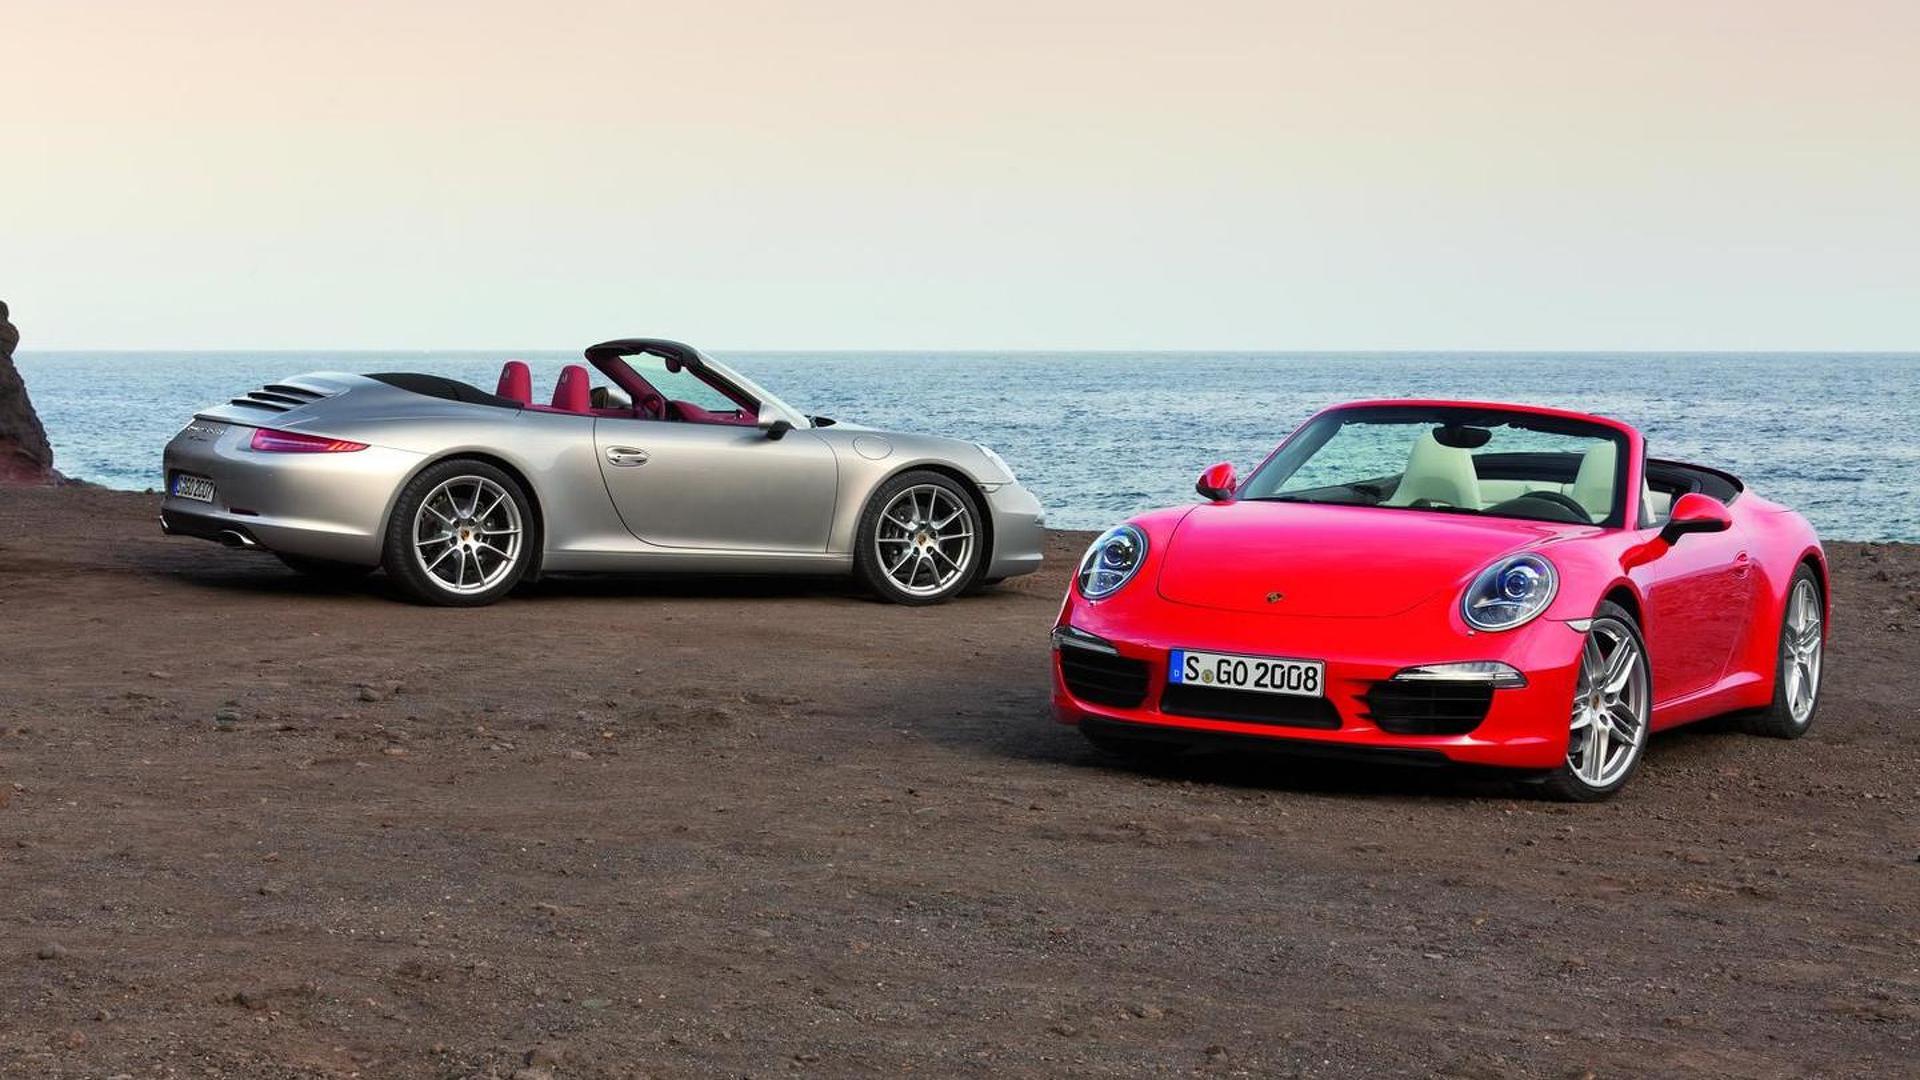 2013 Porsche 911 Cabrio reconfirmed for Detroit unveiling [video]